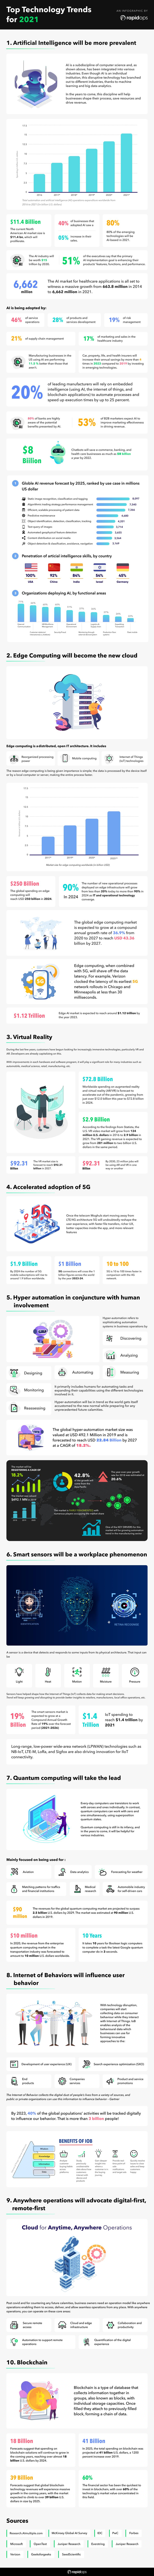 Digital Transformation Trends Infographic